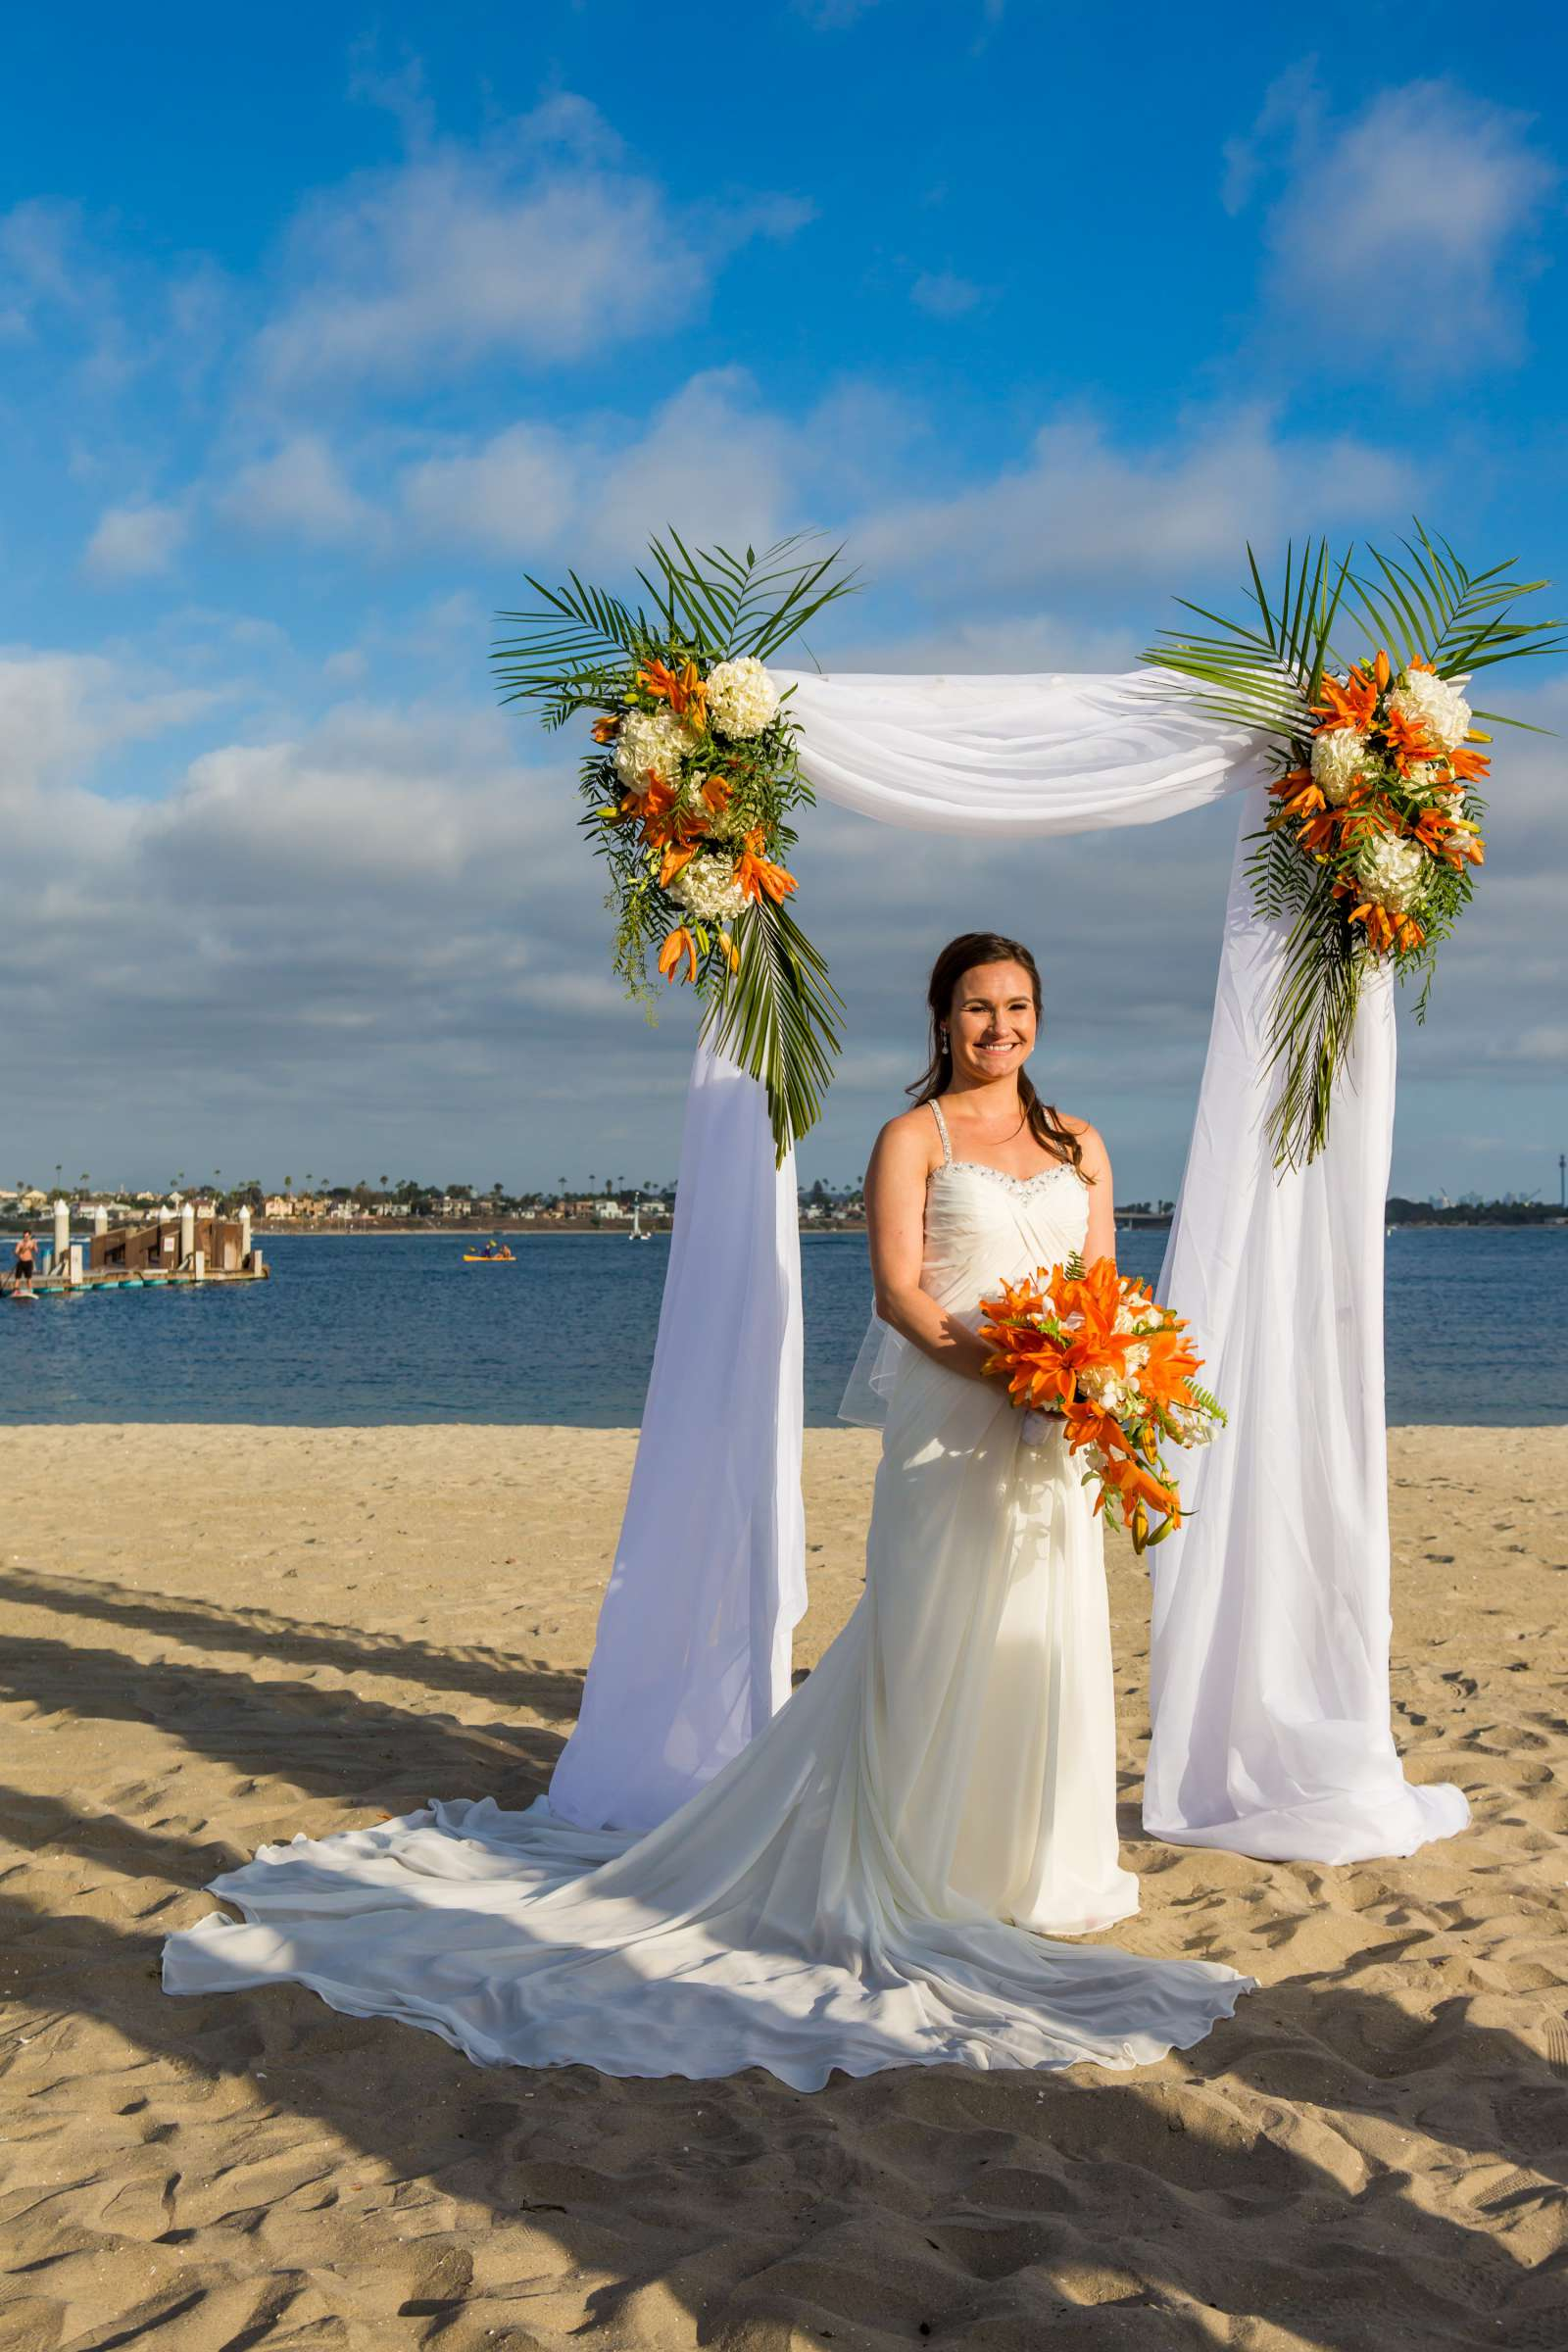 Camellia Wedding Flowers | San Diego Photographer - True Photography